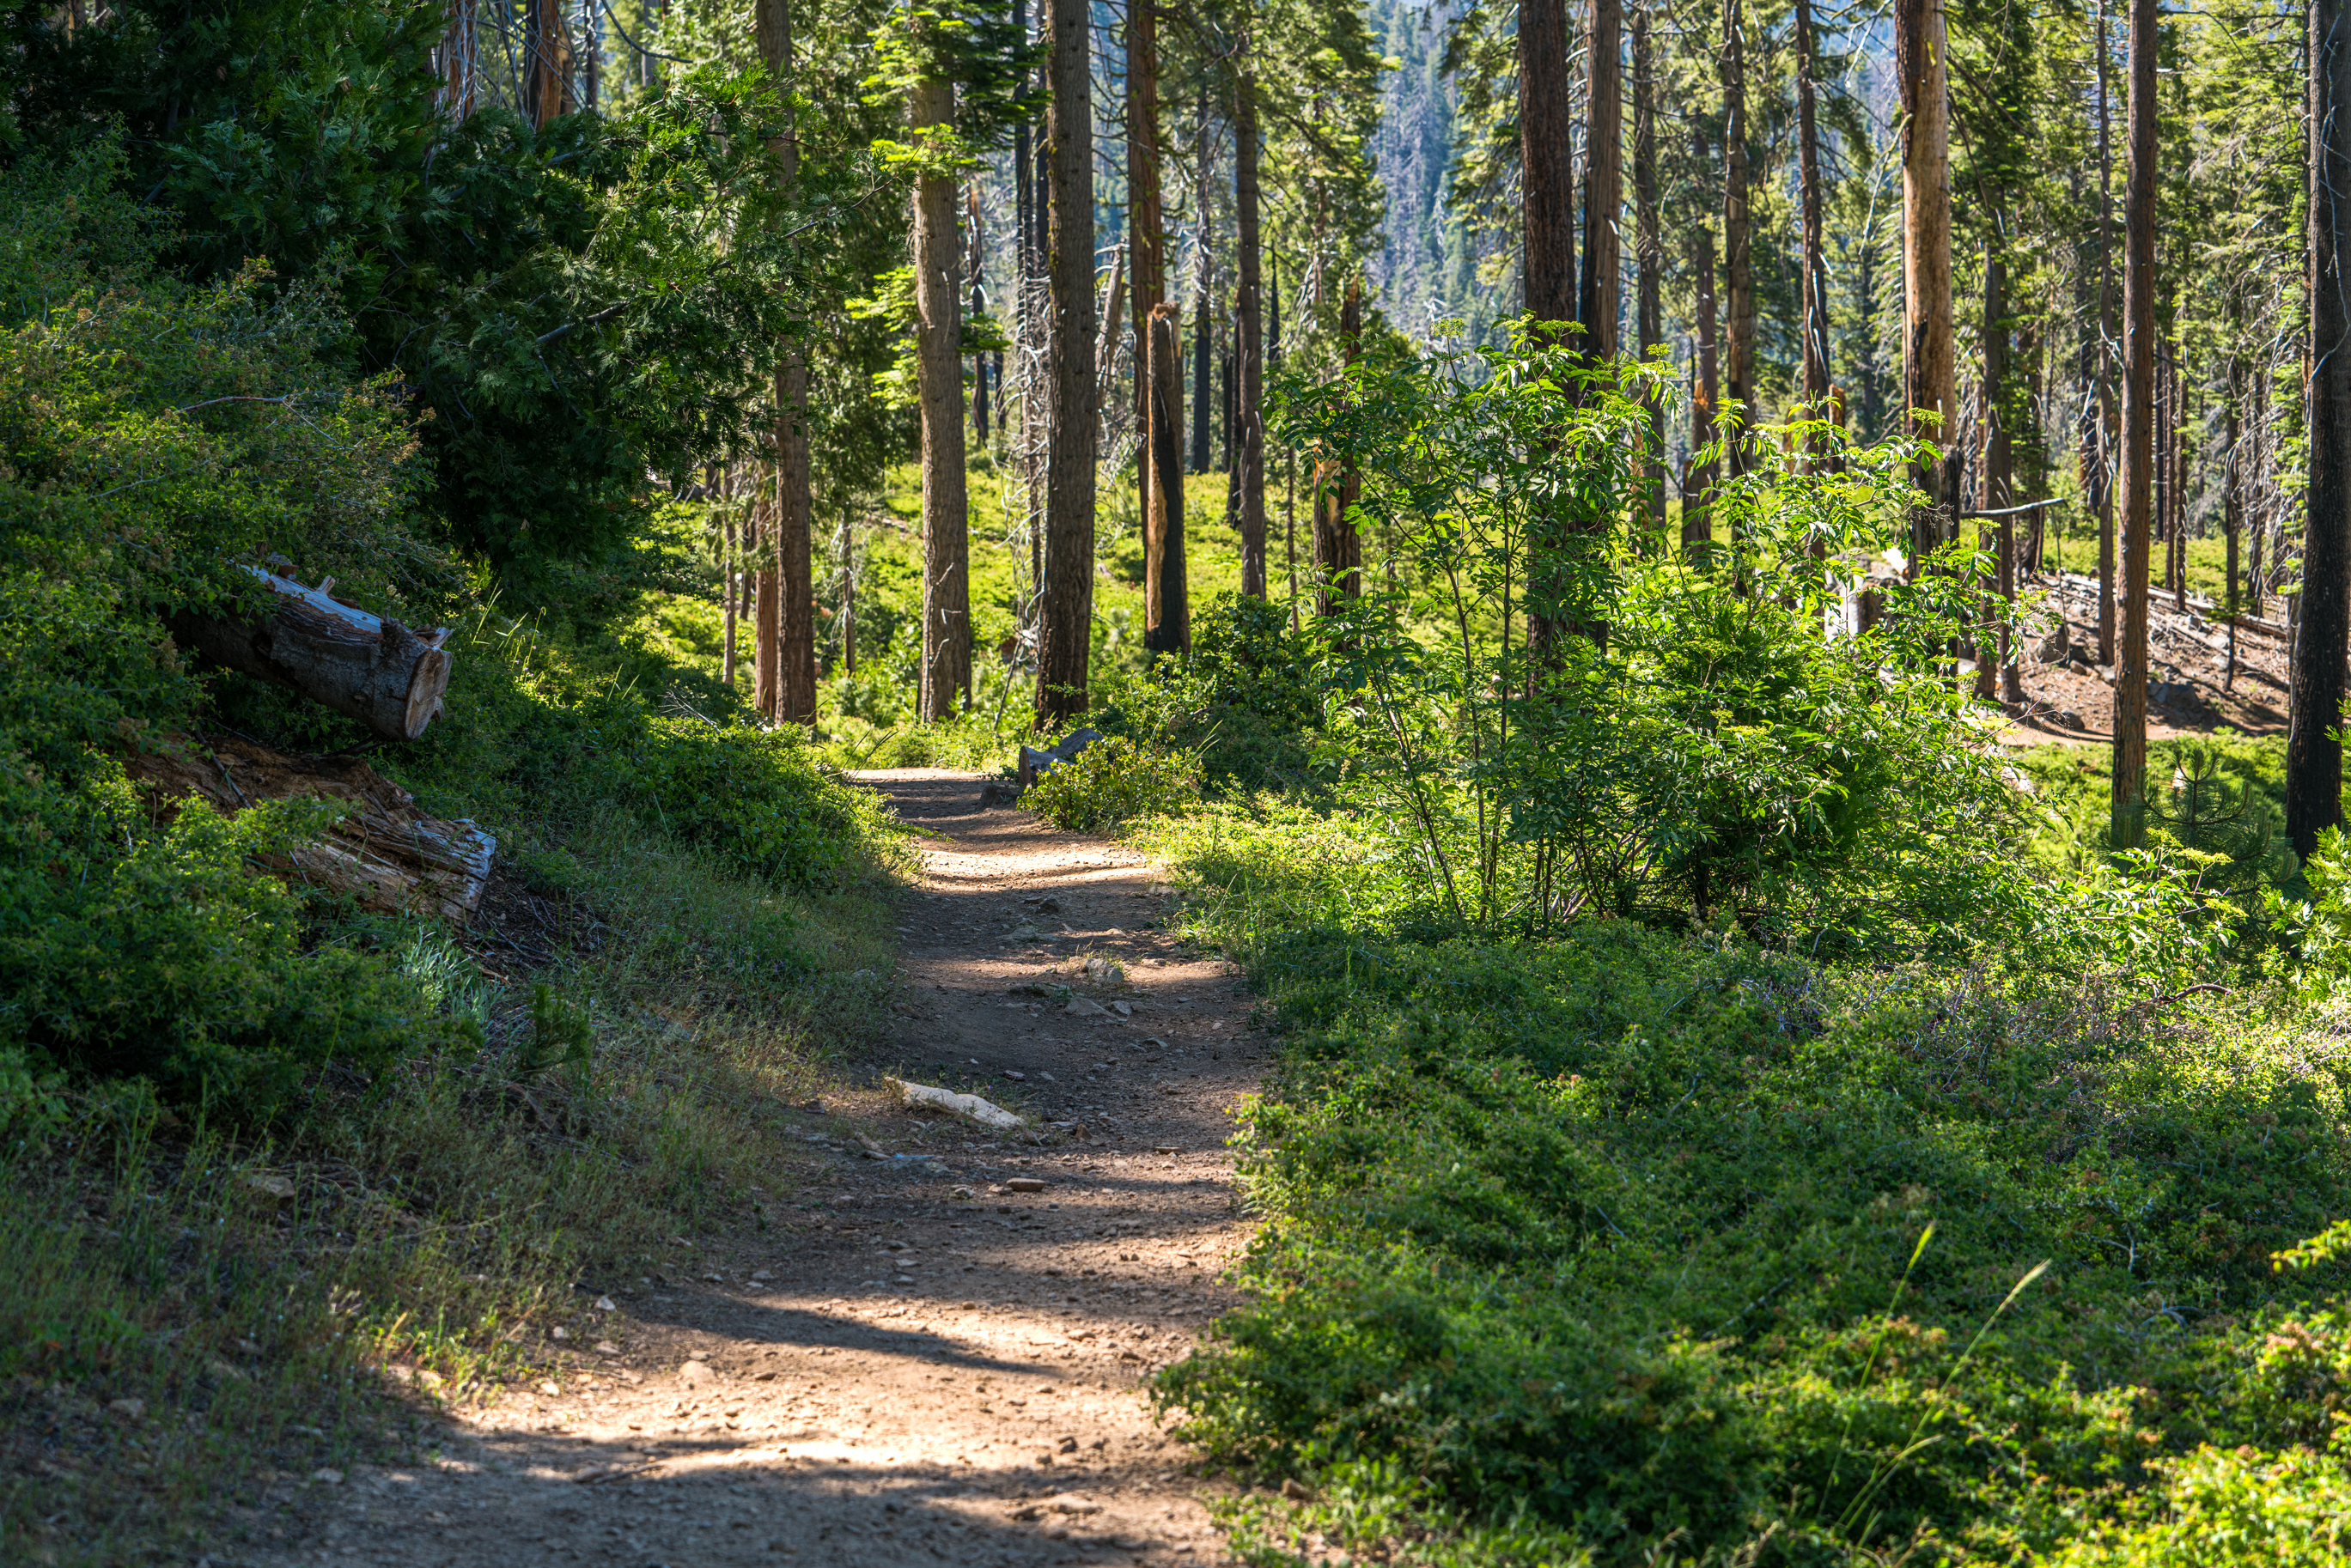 Mariposa Grove, Giant Sequoias, Hiking, Yosemite National Park, Trail